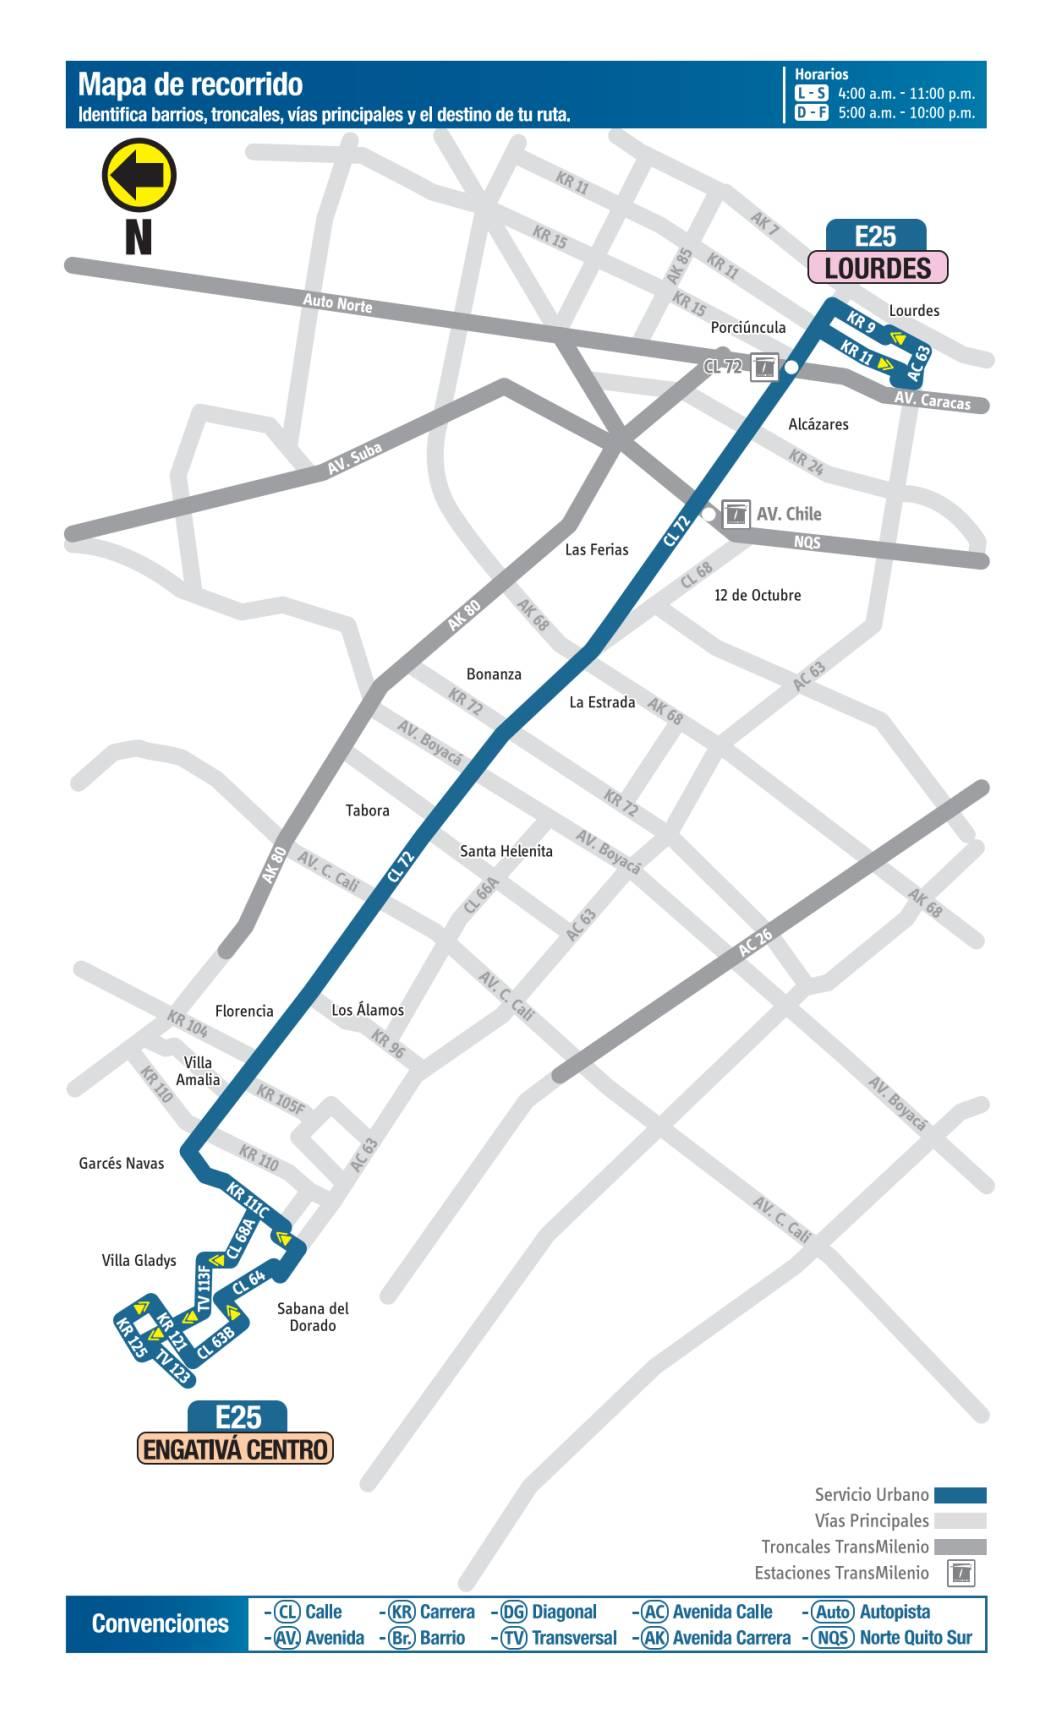 E25 Lourdes - Engativá Centro, mapa bus urbano Bogotá